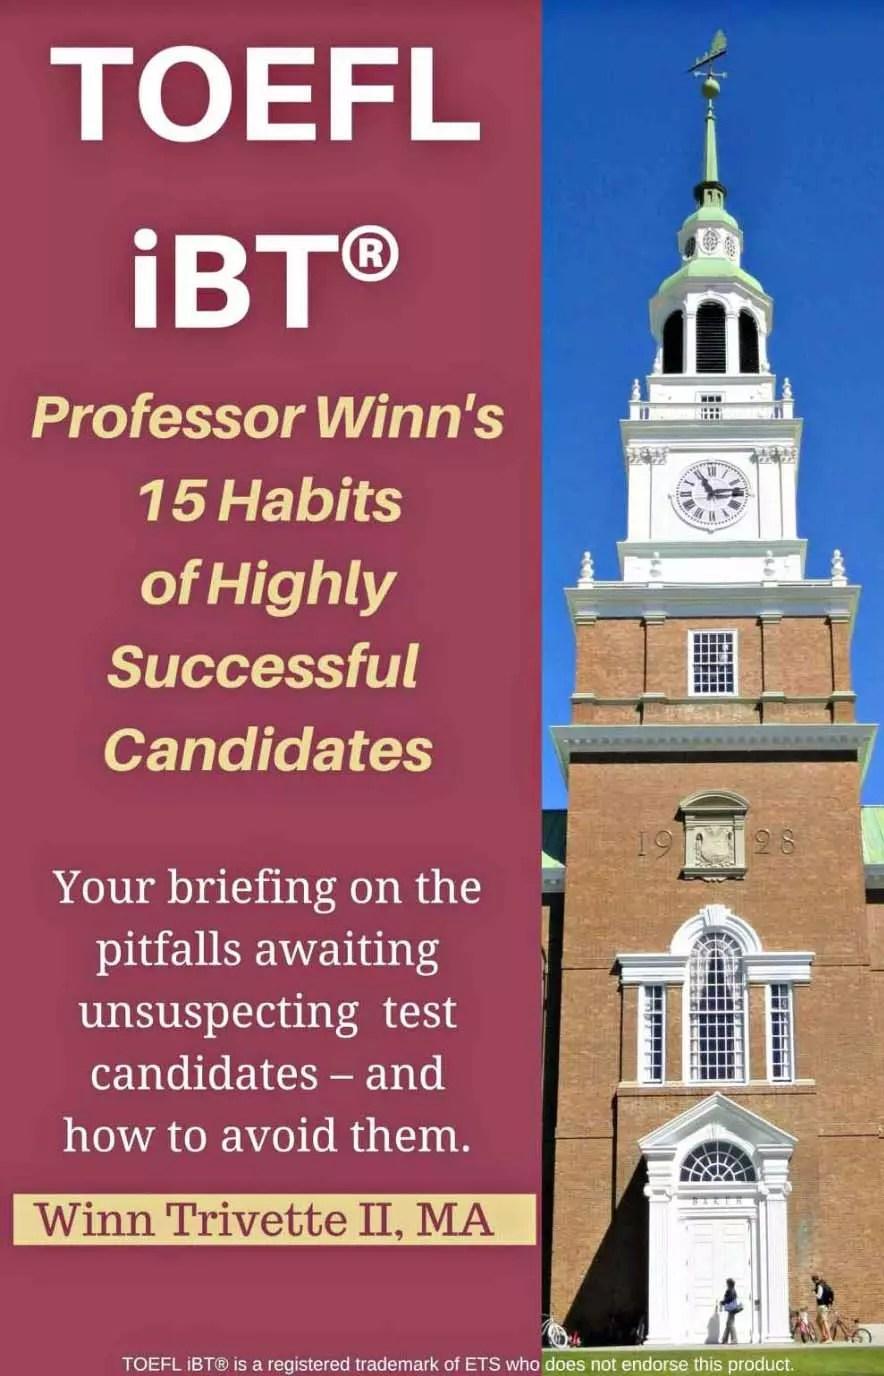 Professor Winn's 15 Habits of Highly Successful TOEFL iBT® Candidates